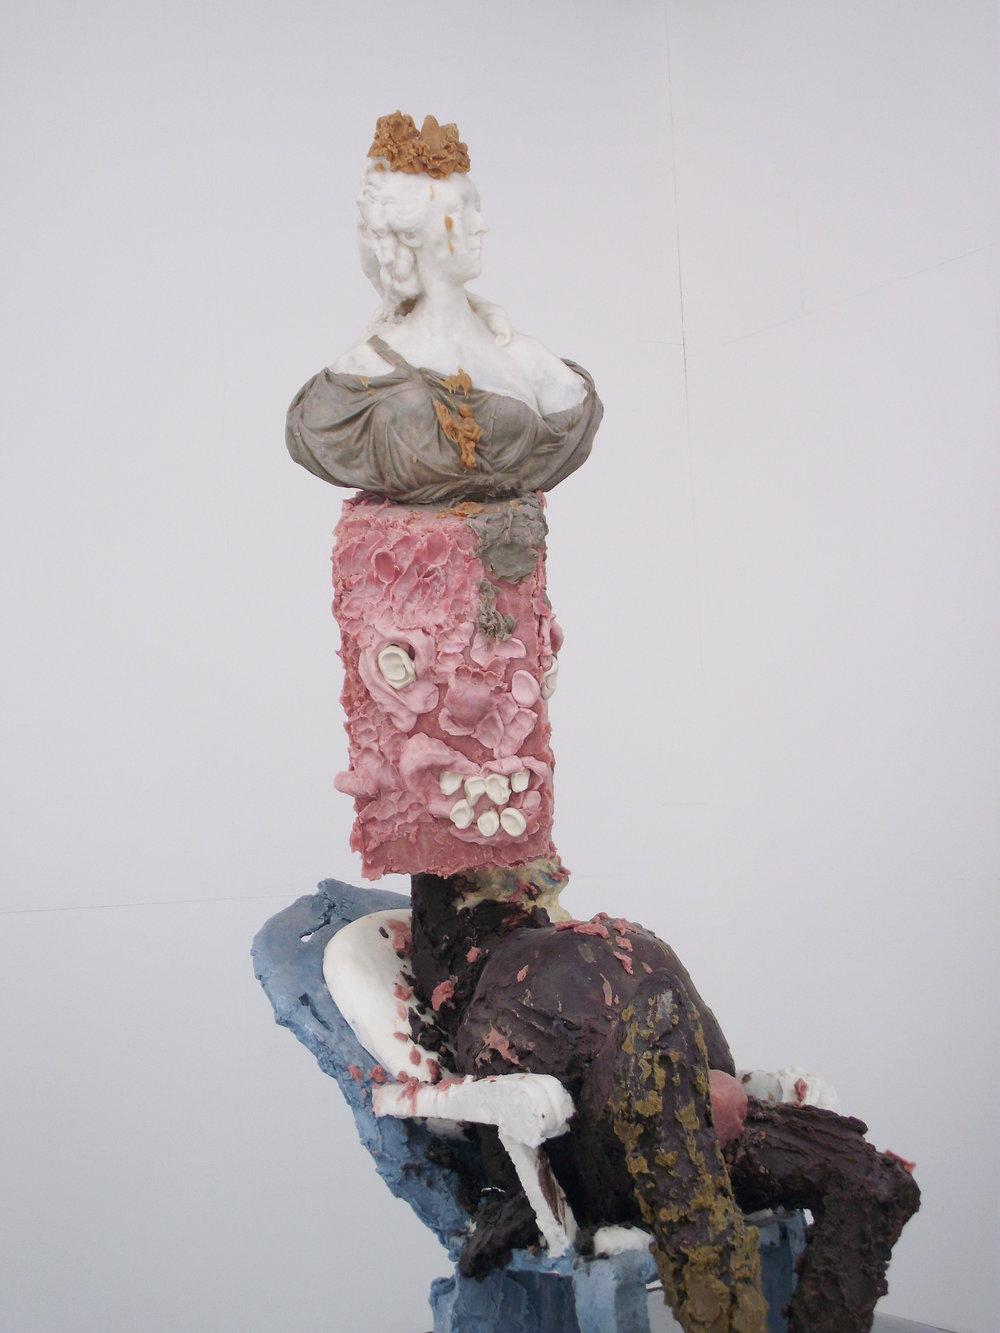 Jamie Fitzpatrick, The Queen (detail), 2015. Wax, Polyurethane Foam, Polystyrene, Steel; 230 x 72 x 130 cm. Image courtesy of the artist.